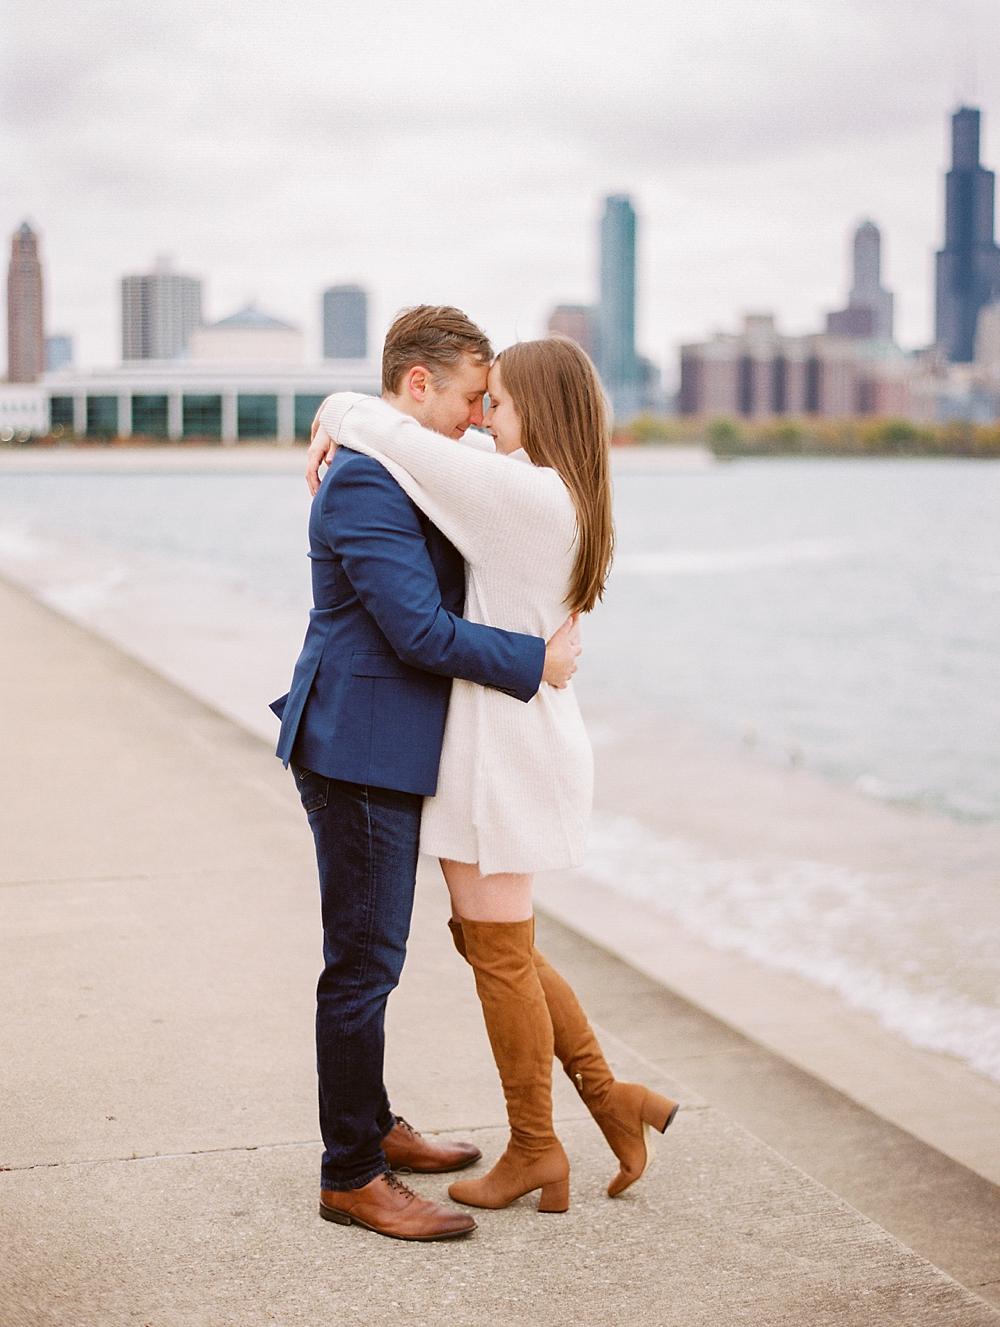 kristin-la-voie-photography-chicago-Wedding-Photographer-museum-campus-adler-planetarium-engagement-50